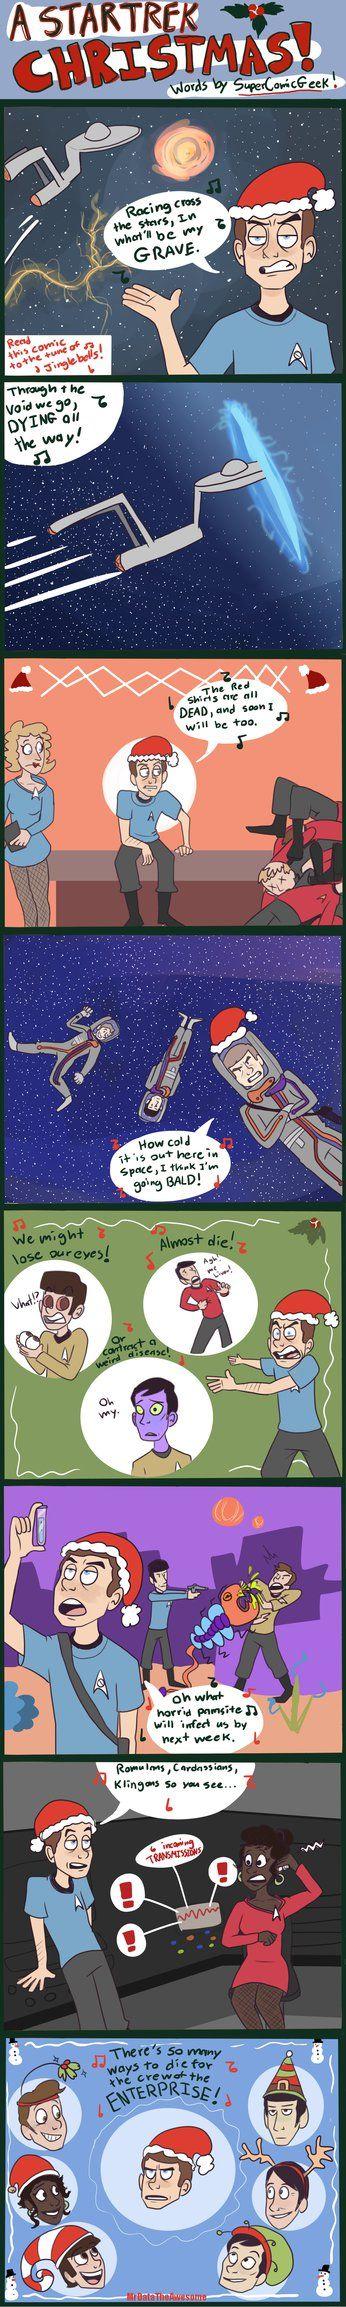 A Star Trek Christmas by MrDataTheAwesome.deviantart.com on @DeviantArt